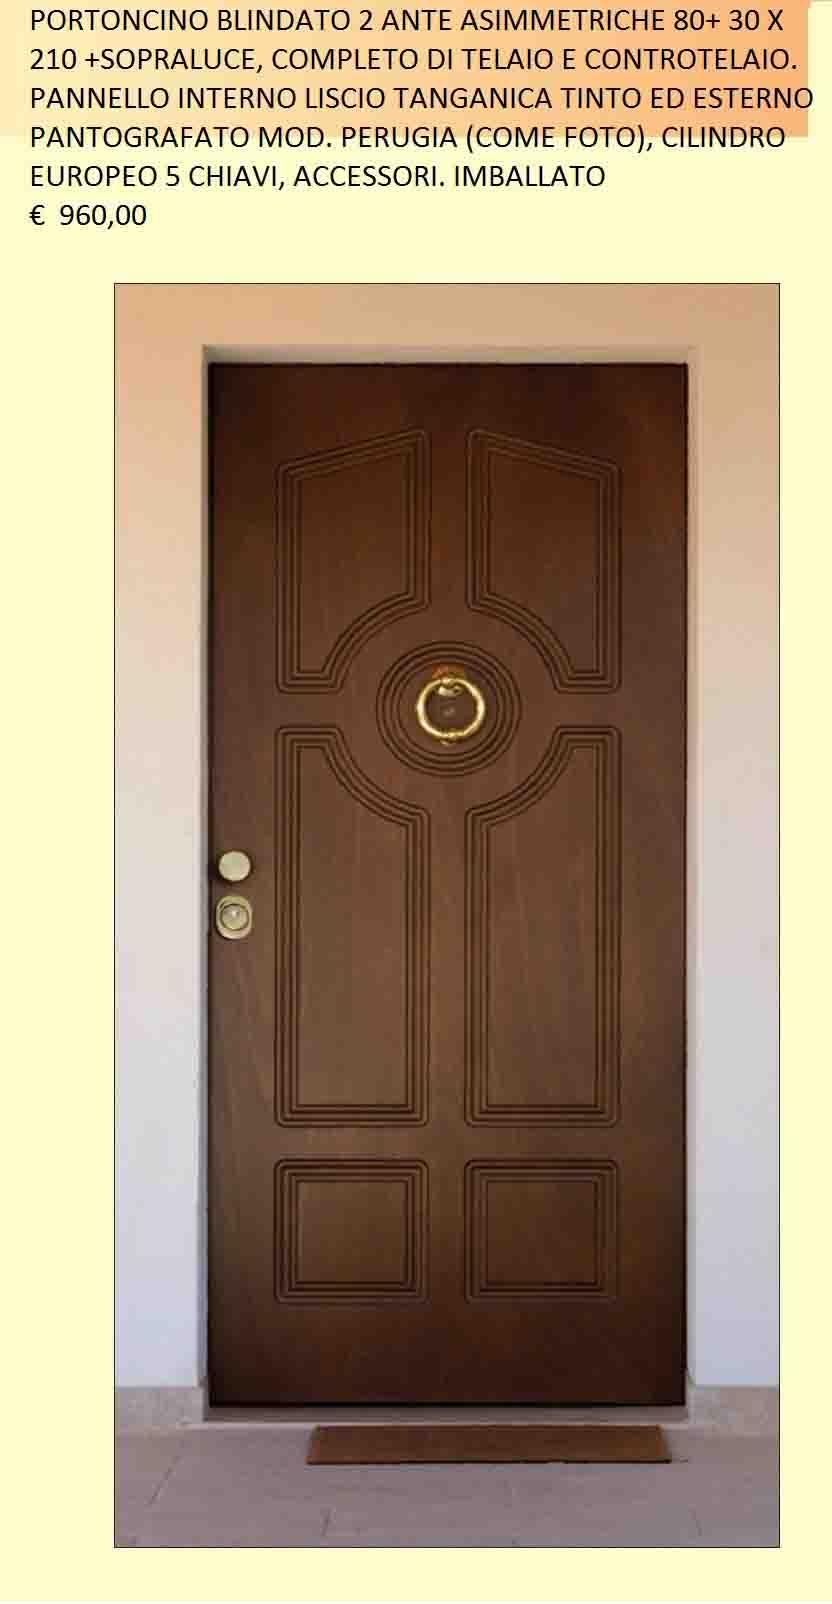 porta blindata 2 ante offerta